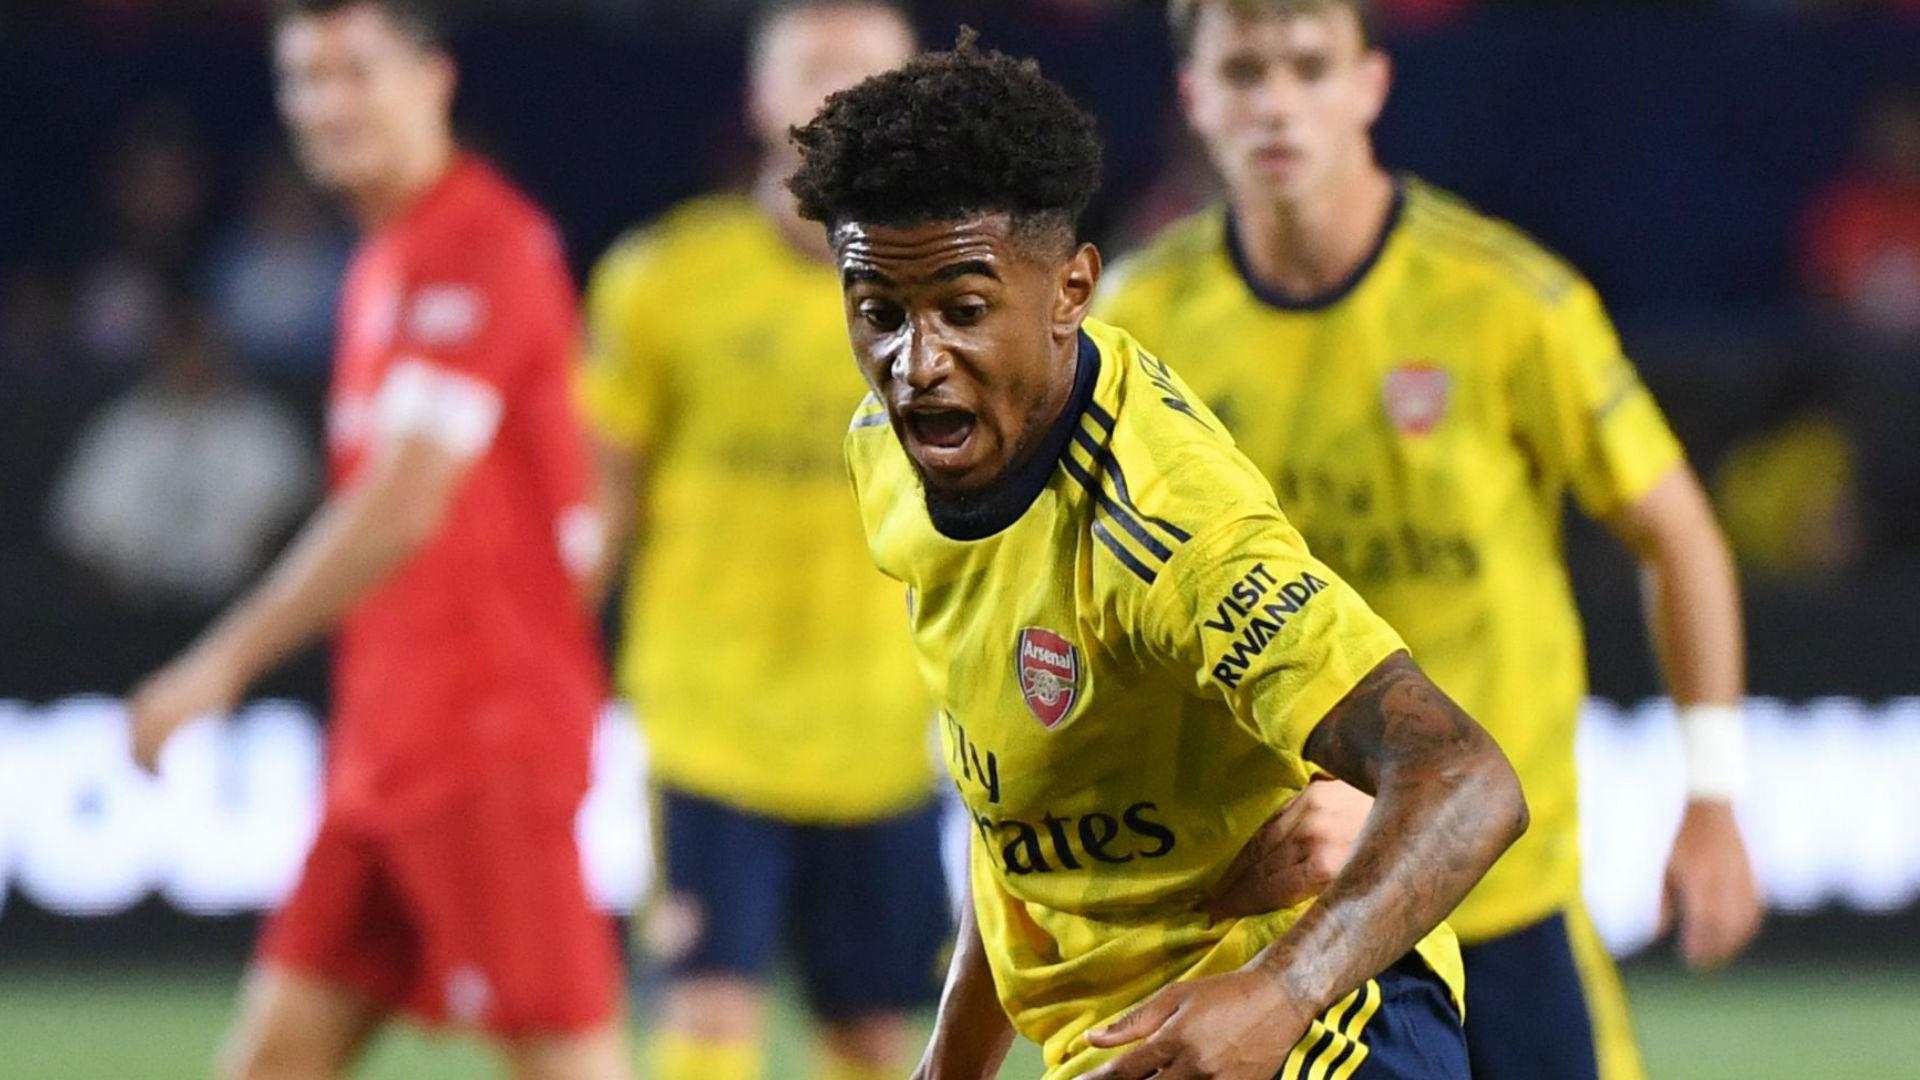 Nelson Arsenal 2019